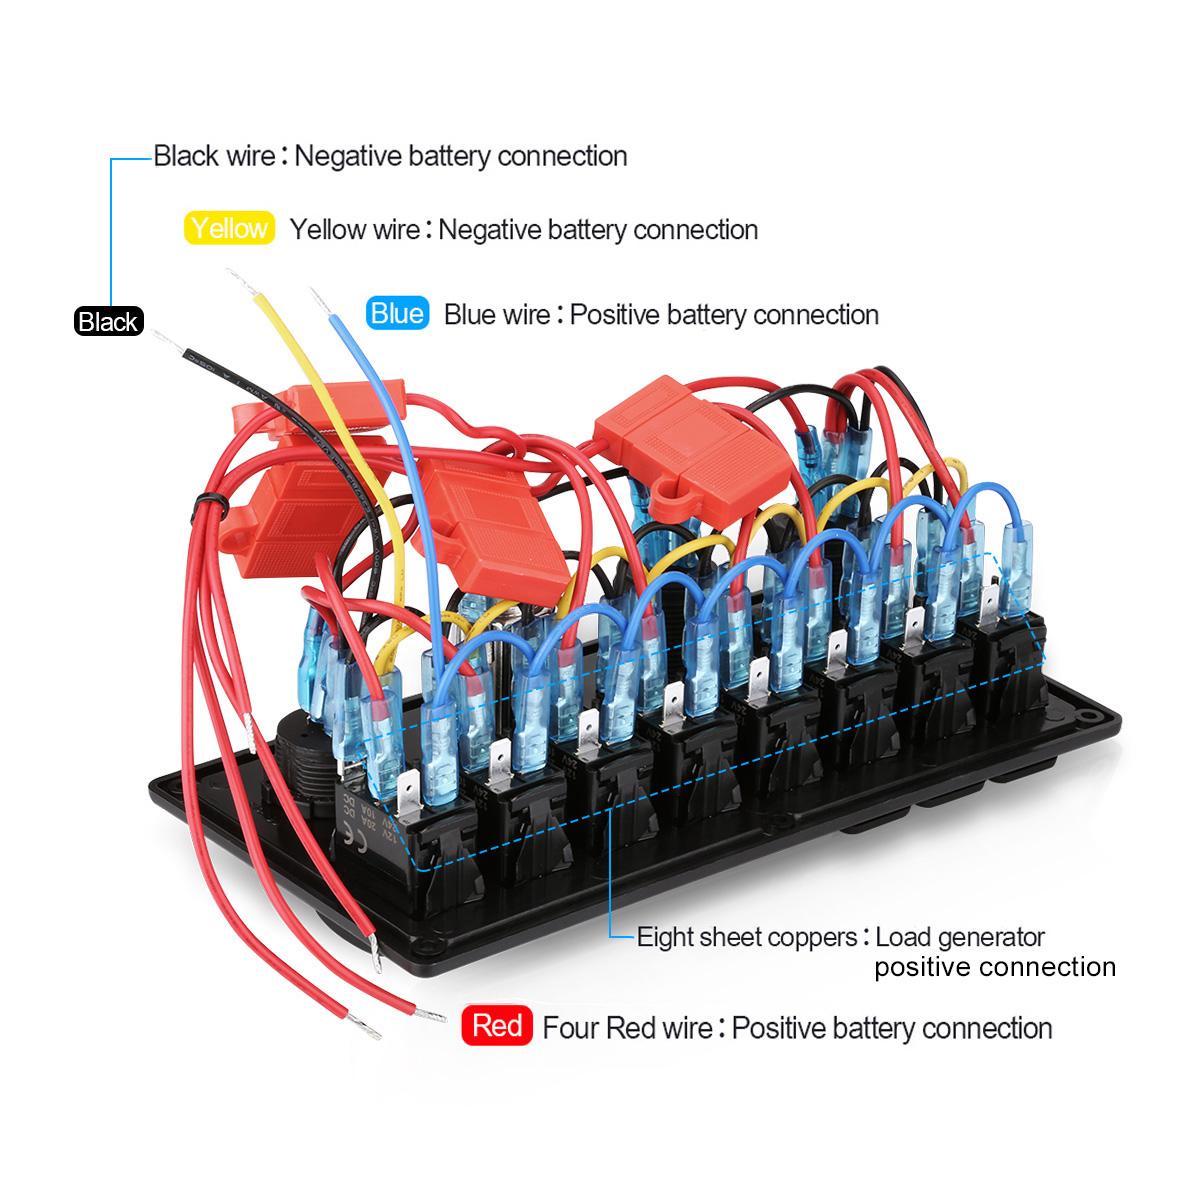 TG_8569] Wiring Diagram Marine Switch Panel Free DiagramBoapu Nuvit Etic Mohammedshrine Librar Wiring 101